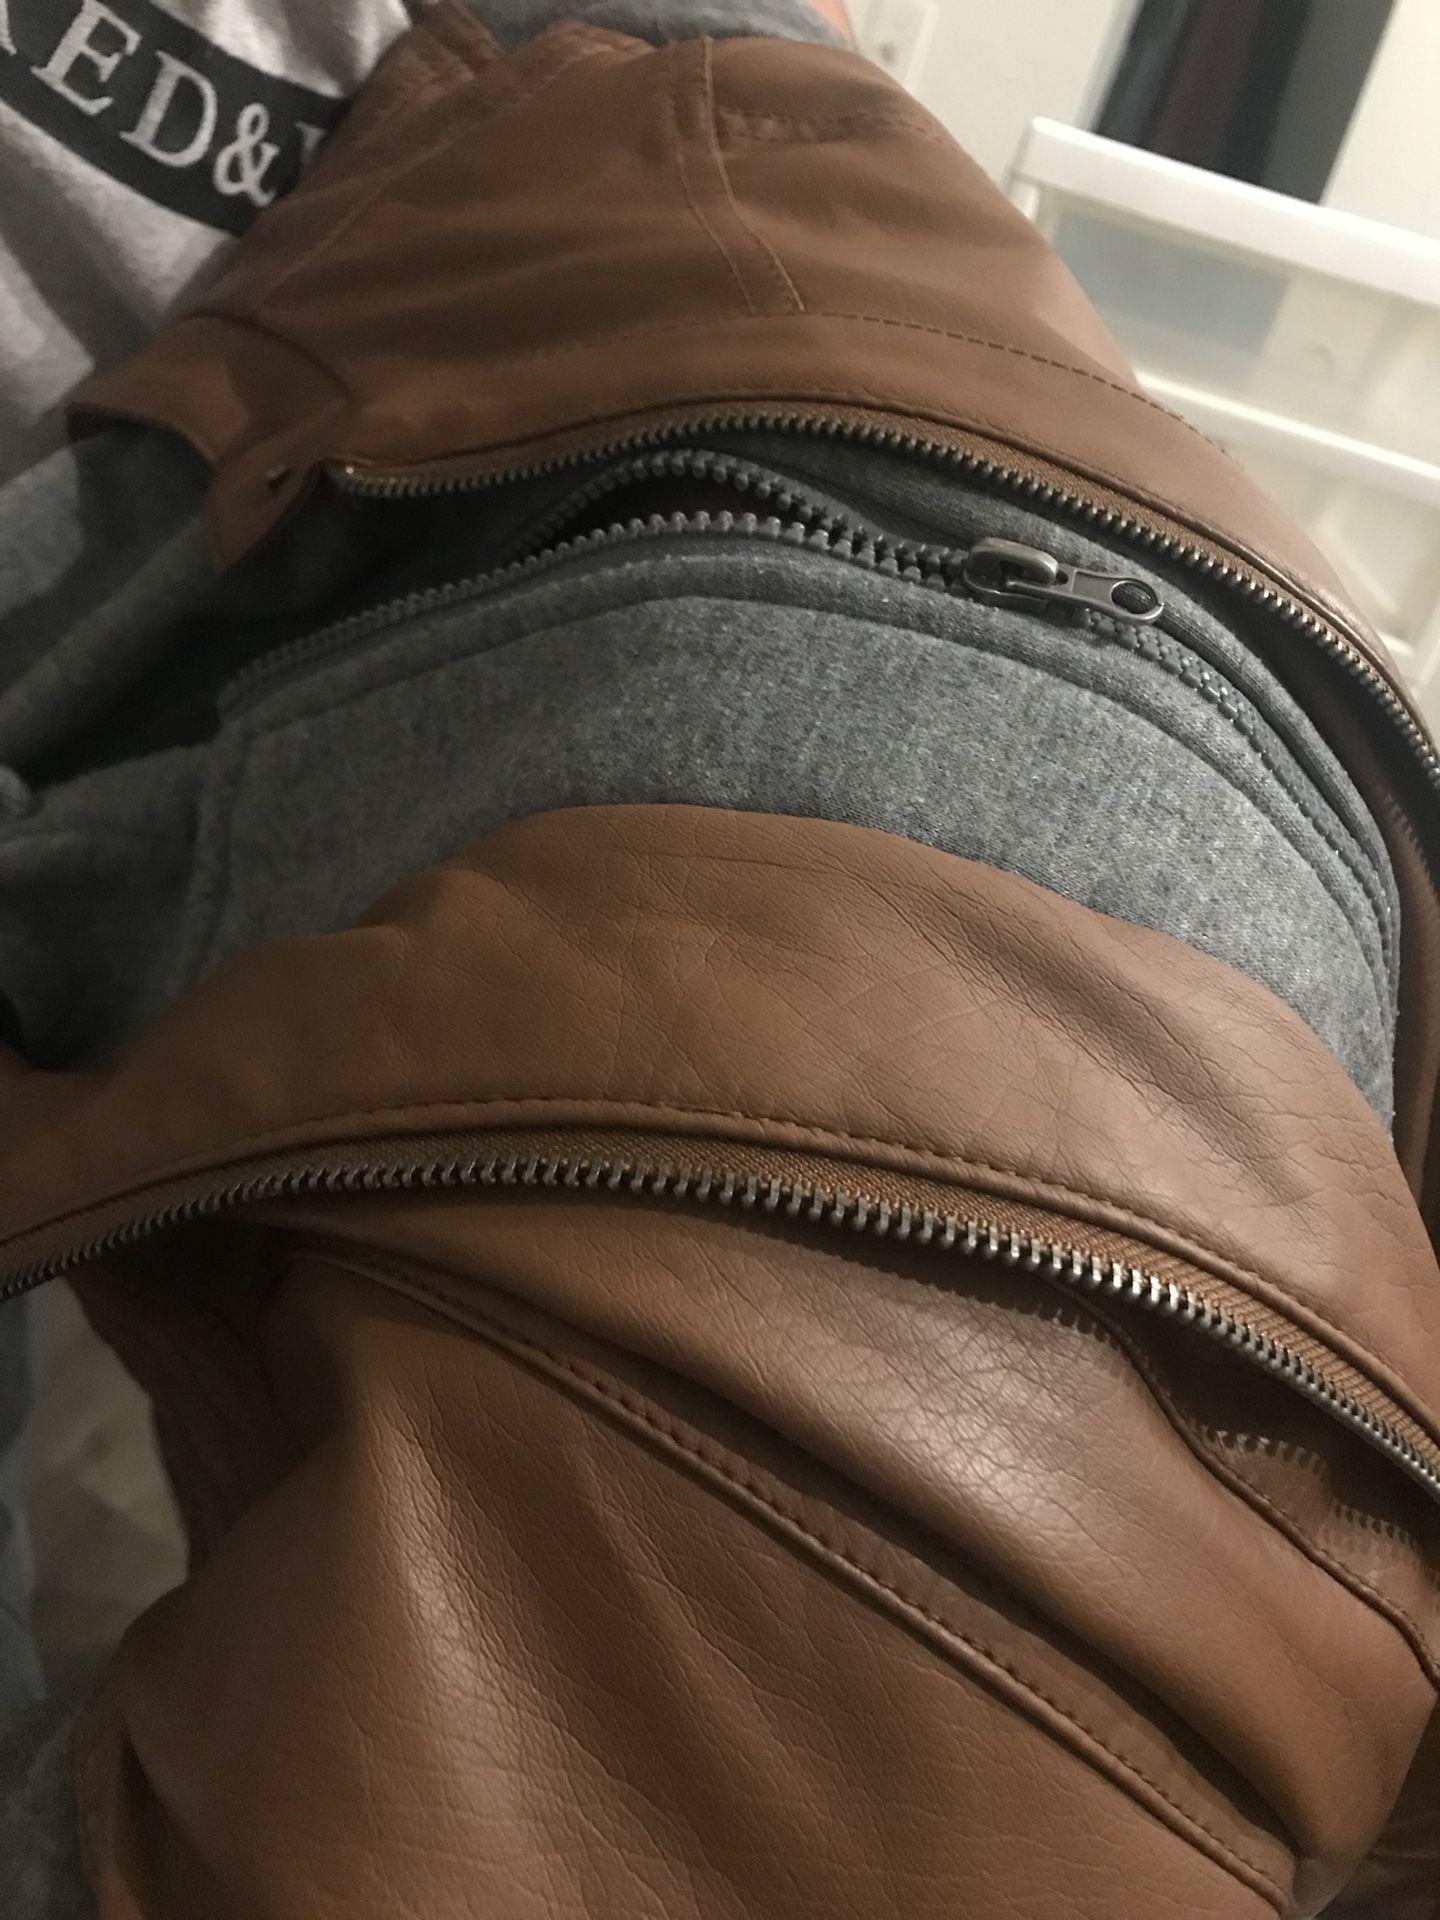 Pleather brown jacket